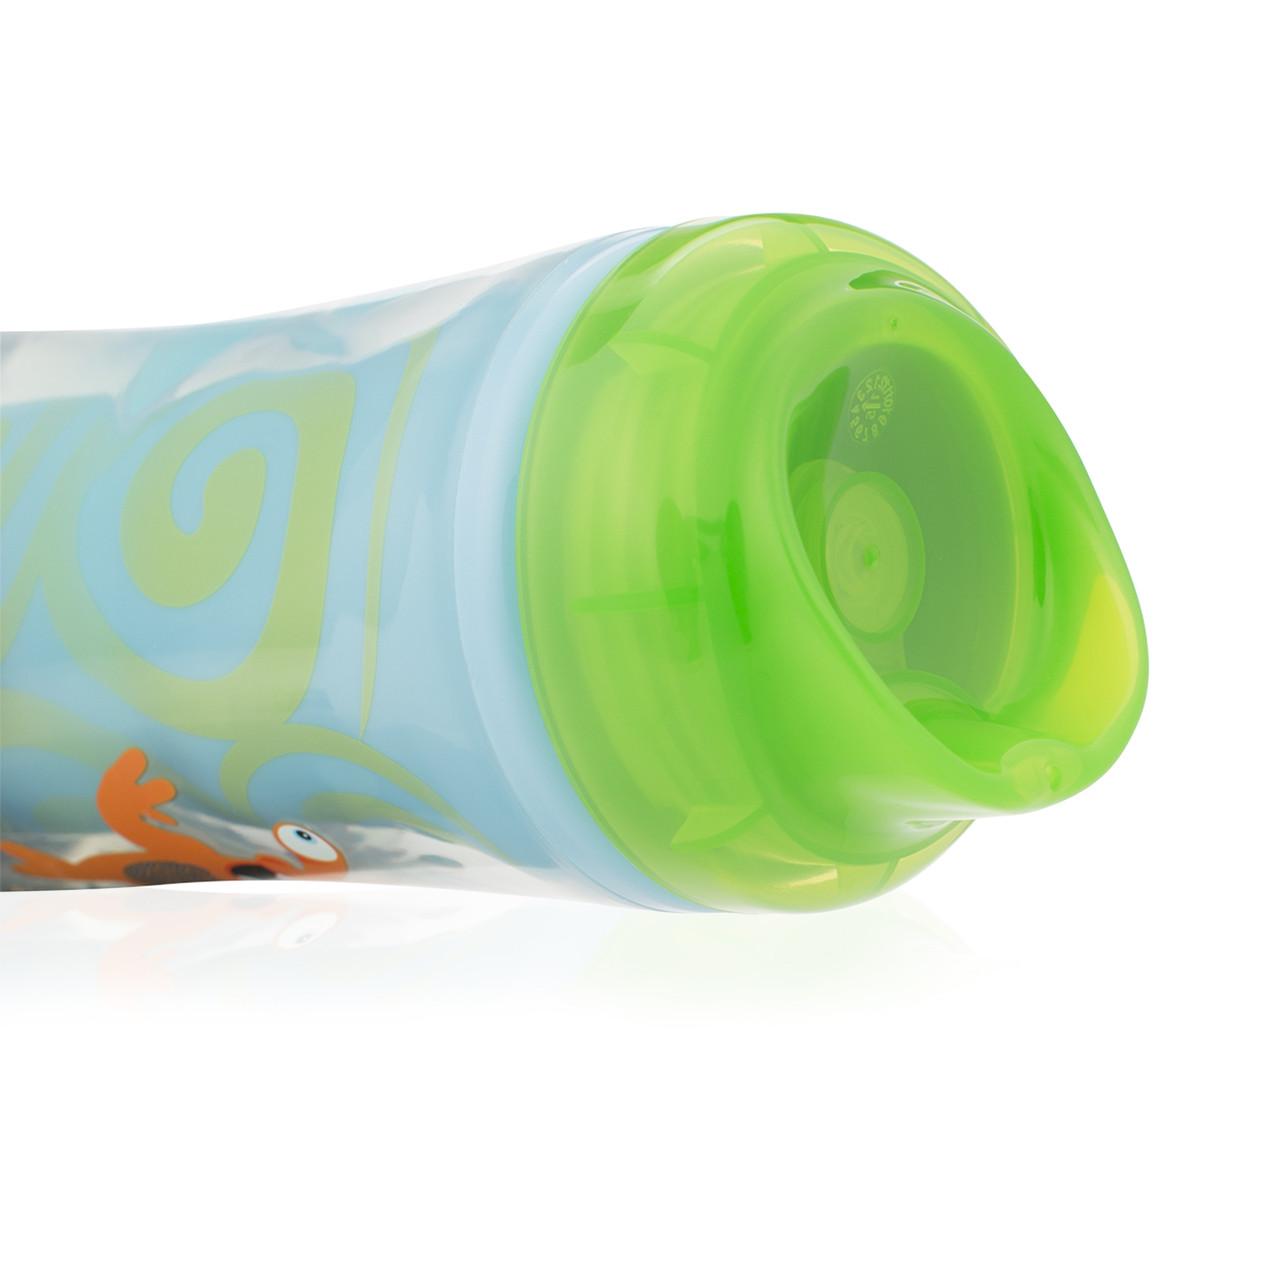 Чашка-термос 300 мл., 12+, без носика